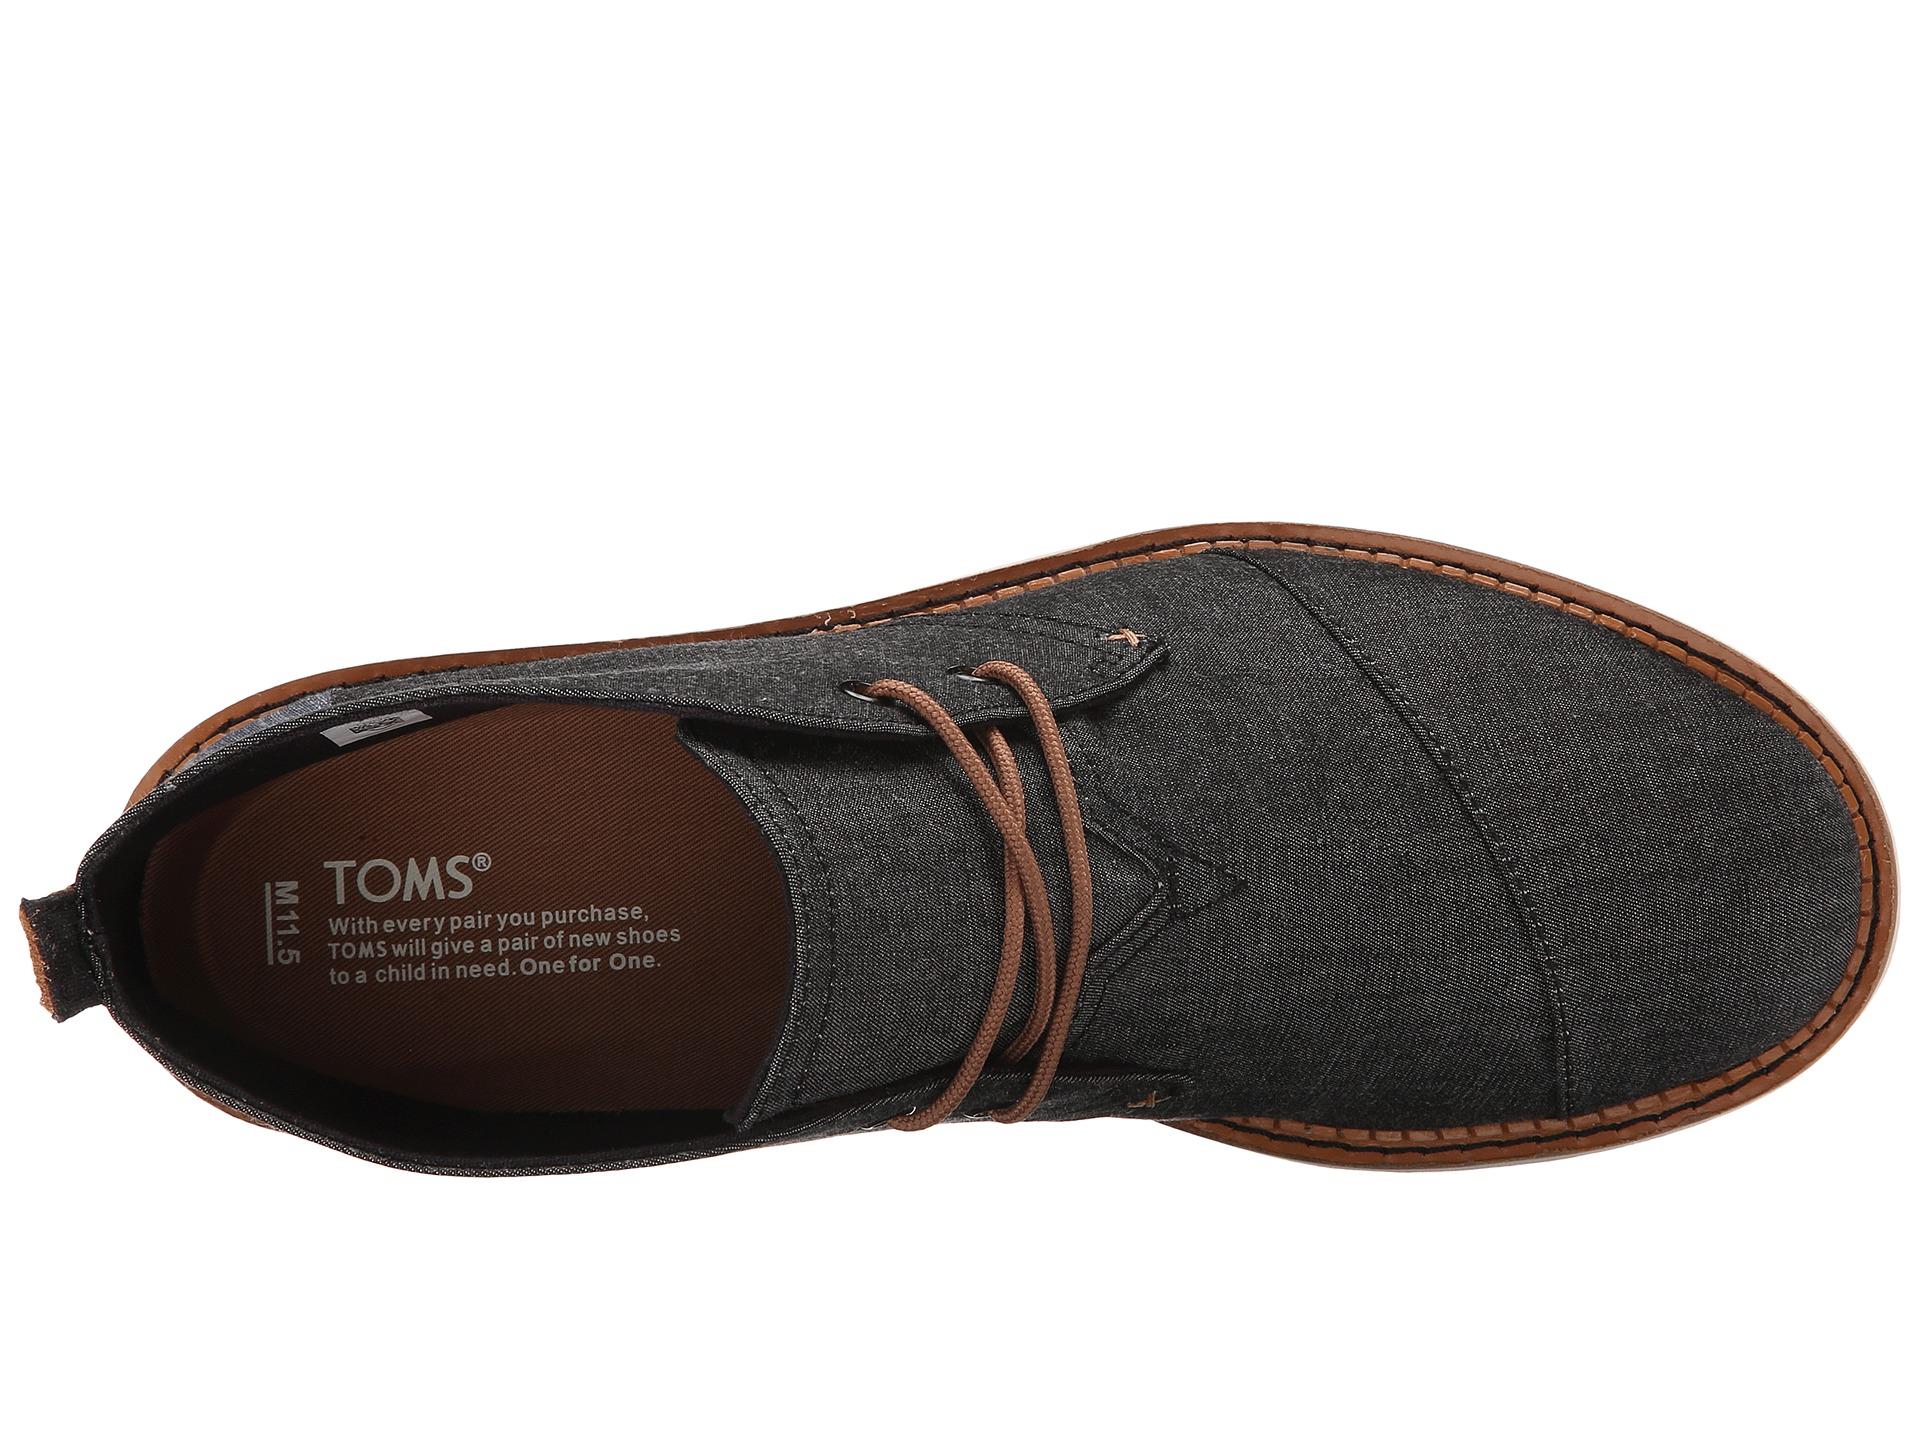 TOMS Mateo Chukka Boot - Zappos.com Free Shipping BOTH Ways